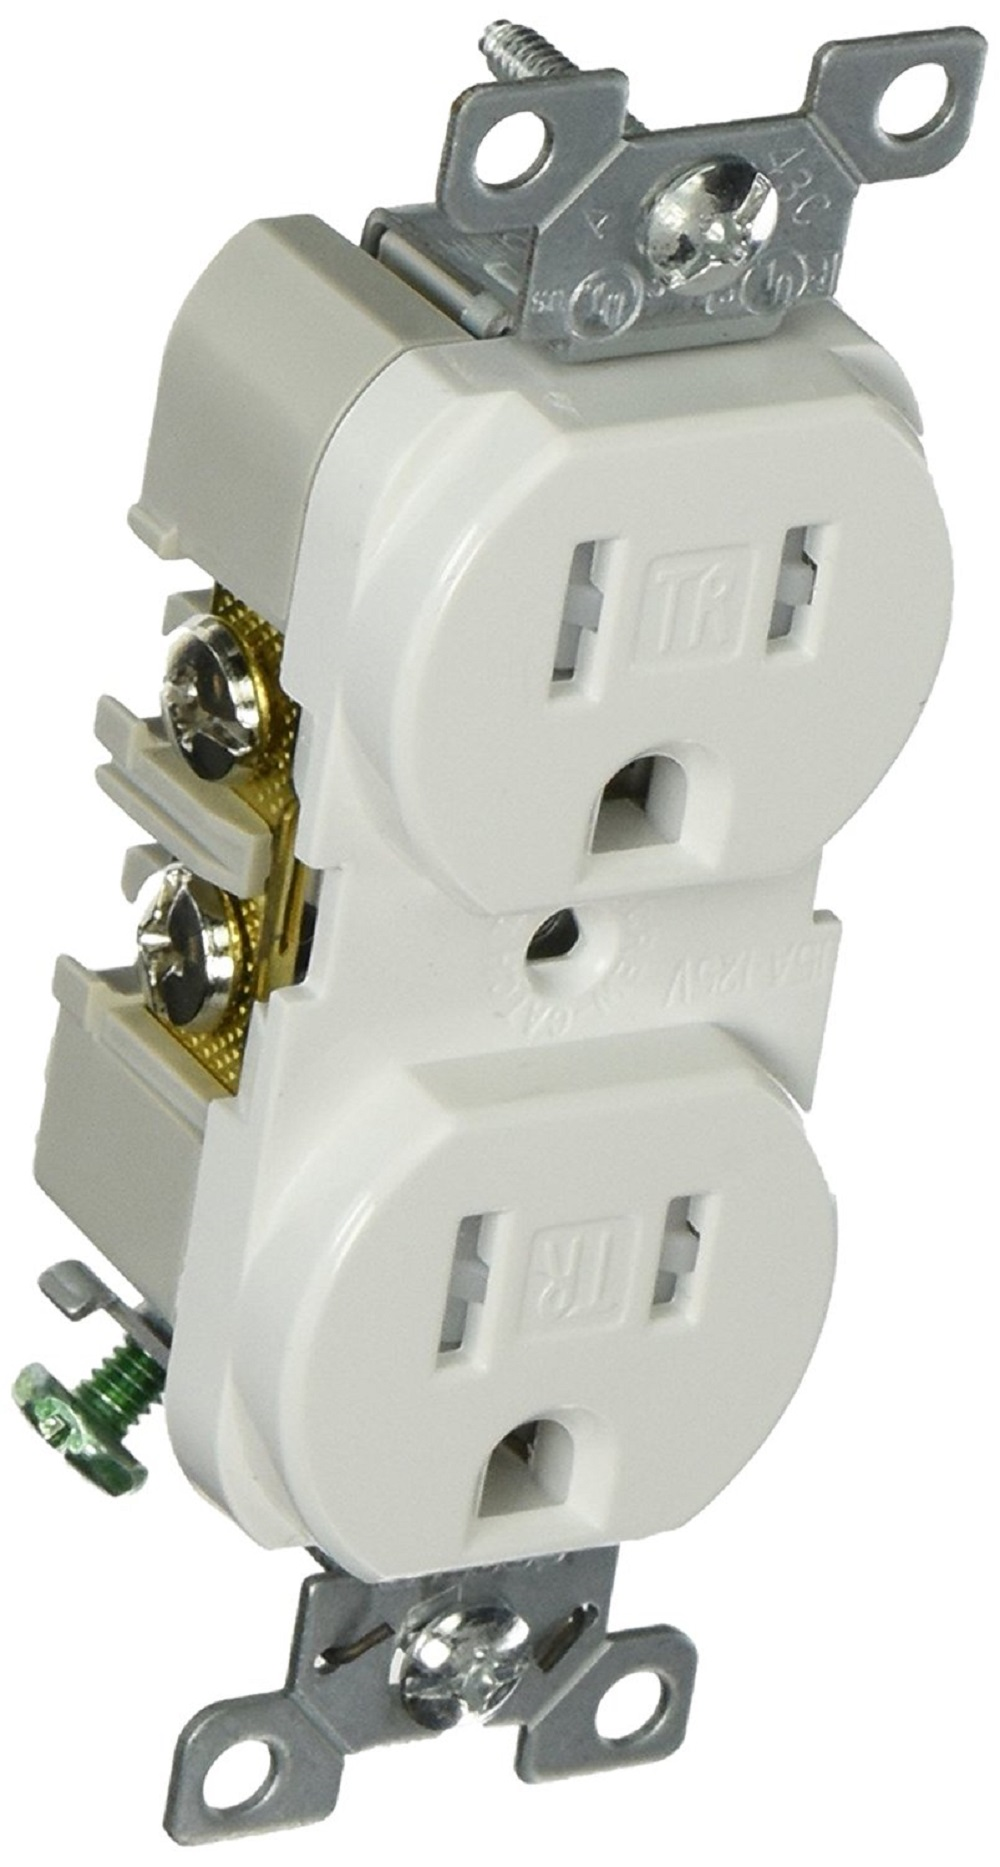 medium resolution of cooper wiring trbr15w bxsp duplex receptacle white lot of 3